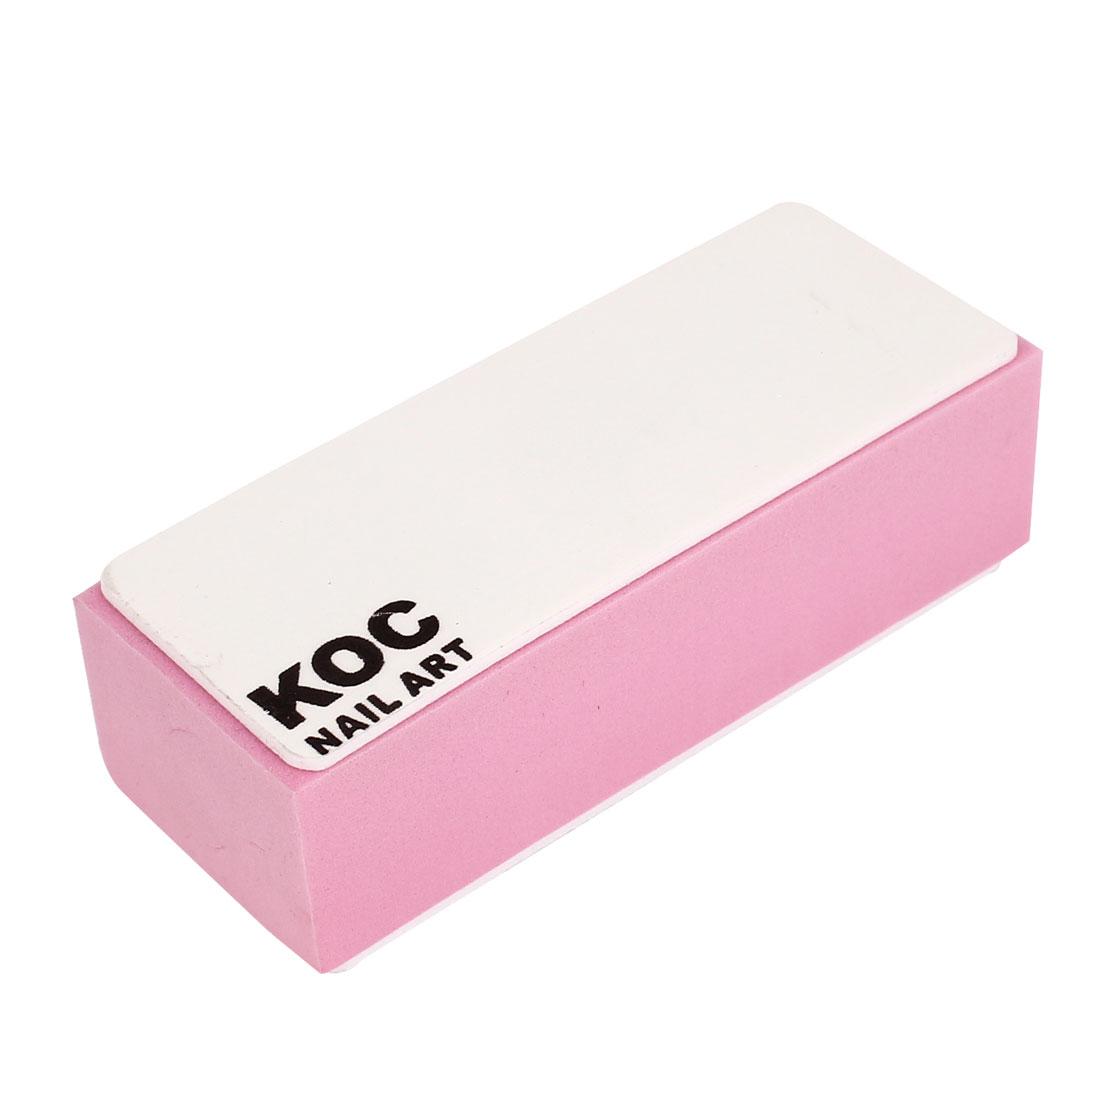 Women Nail File Sanding Buffer Block Acrylic Manicure Art Tips Polish Tool Pink